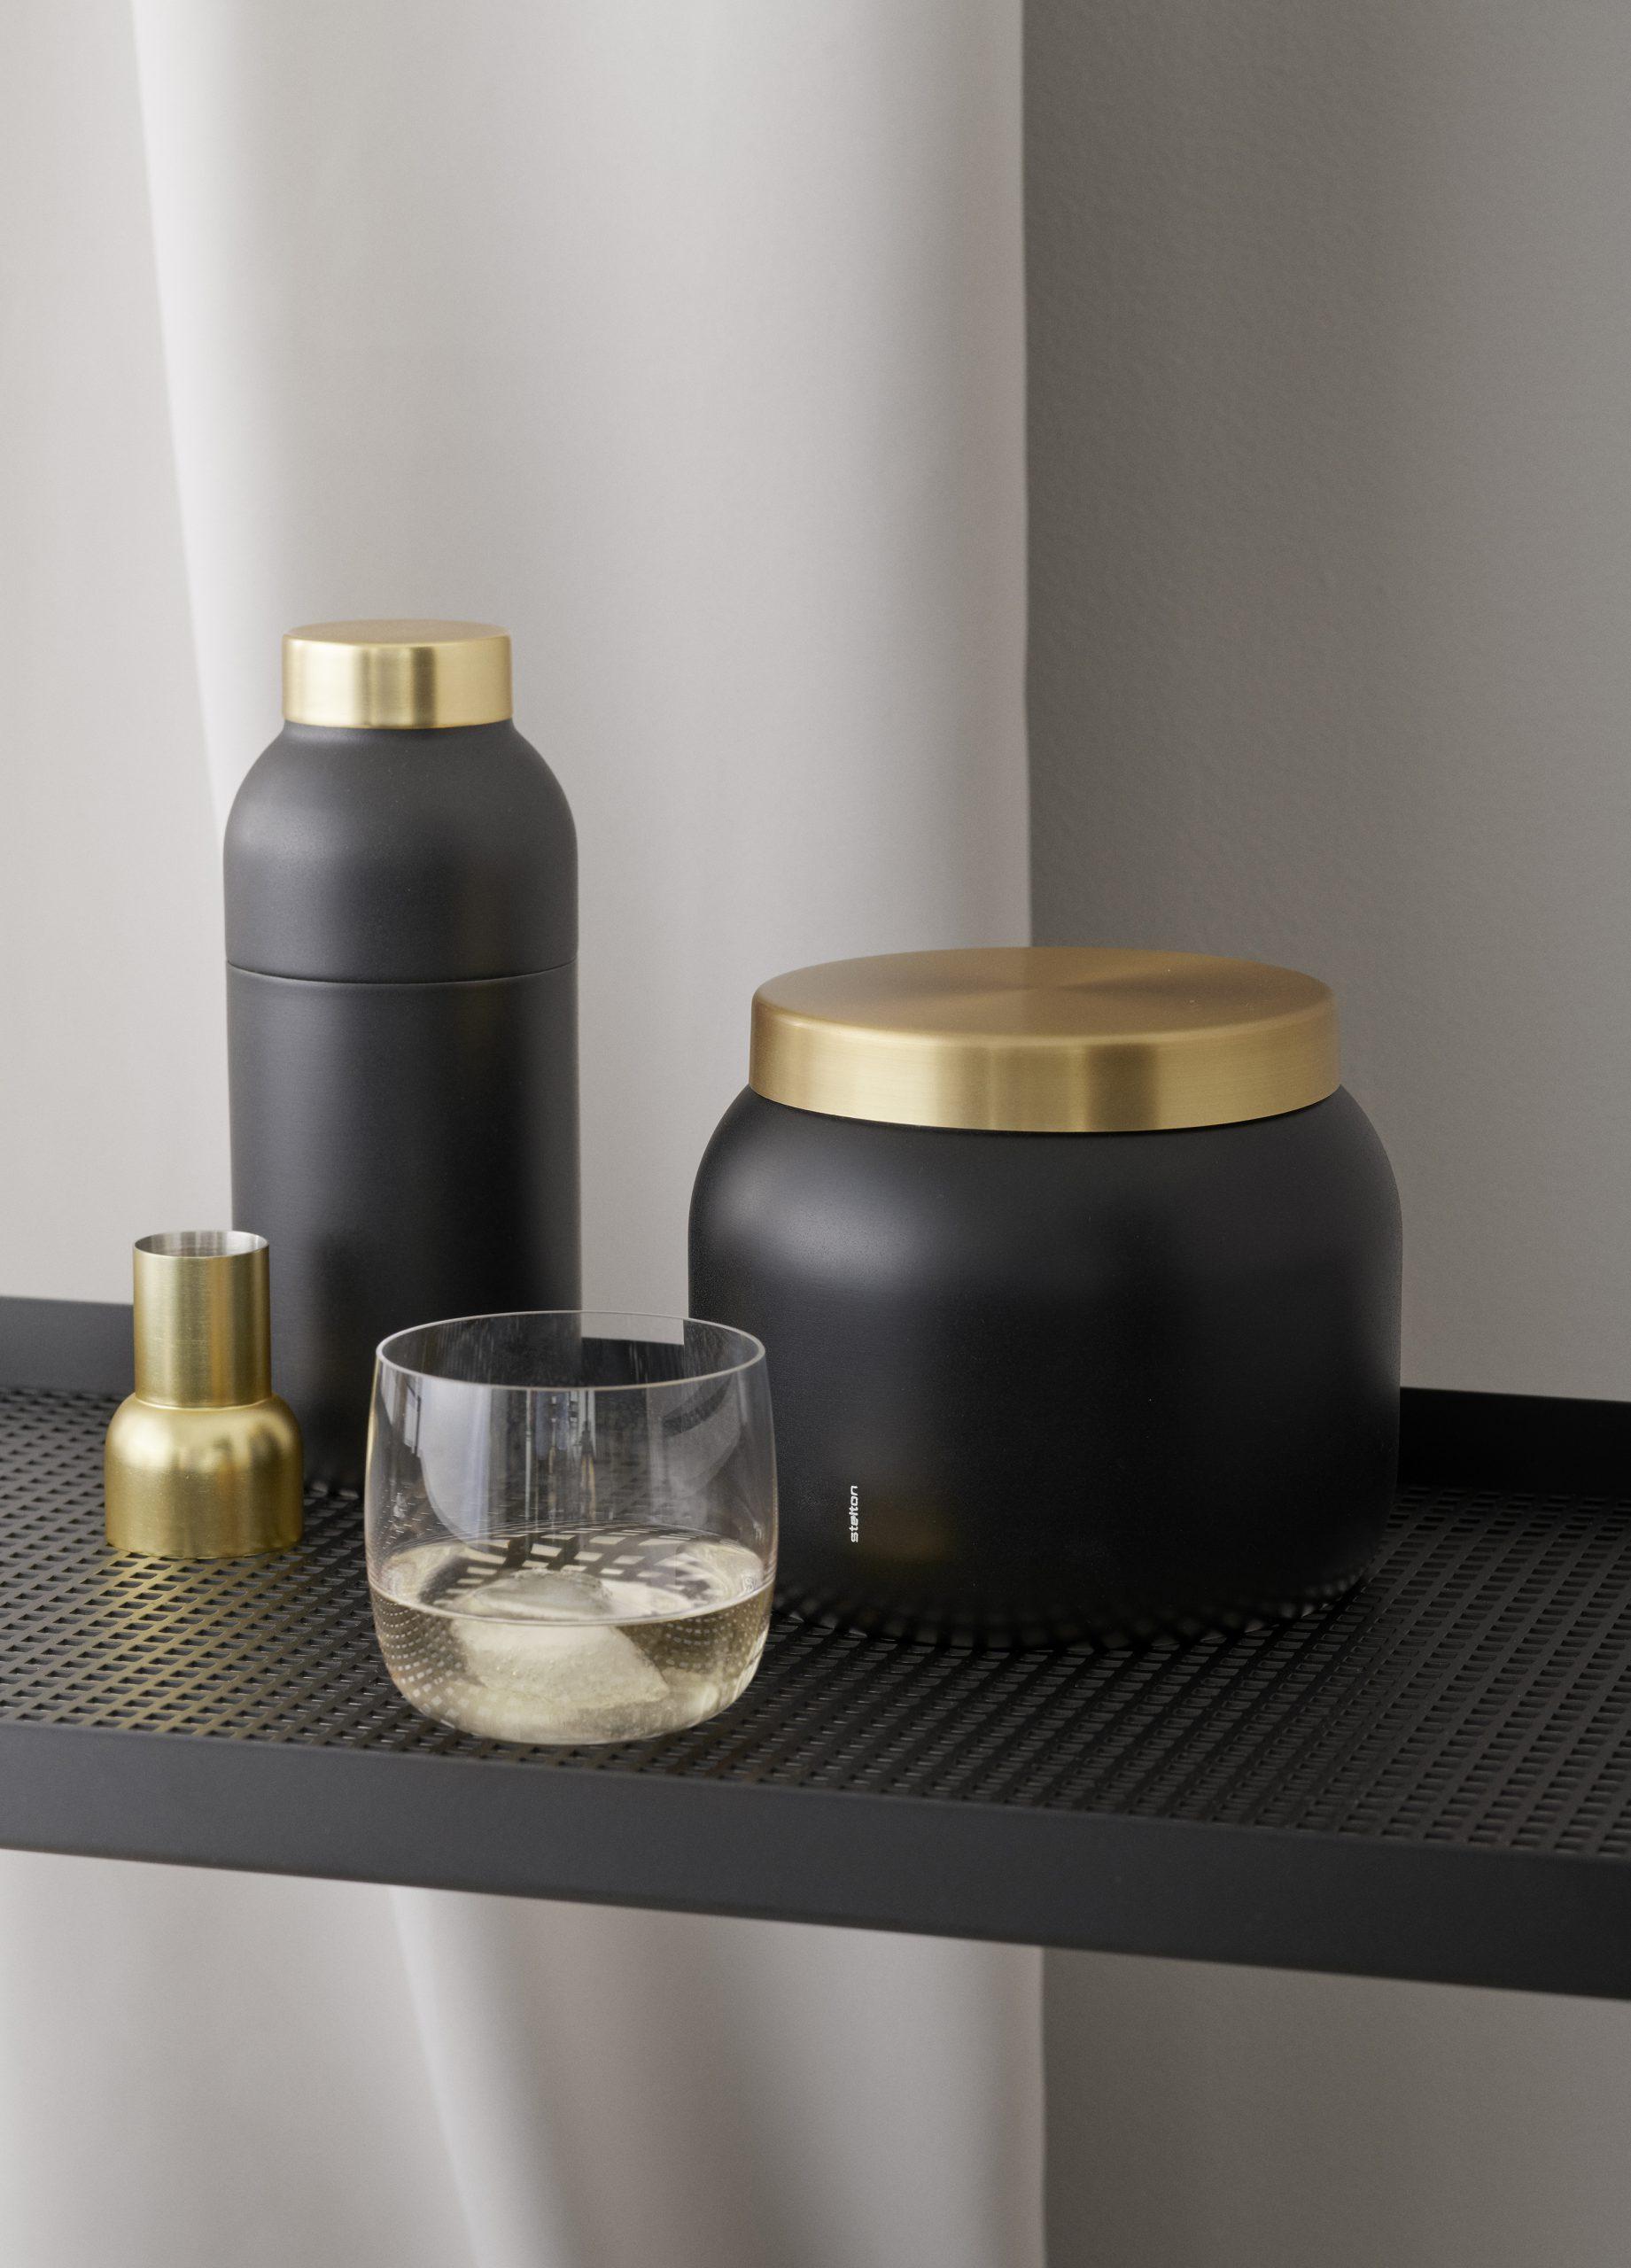 Collar Ice bucket and cocktail shaker by Debiasi Sandri for Stelton